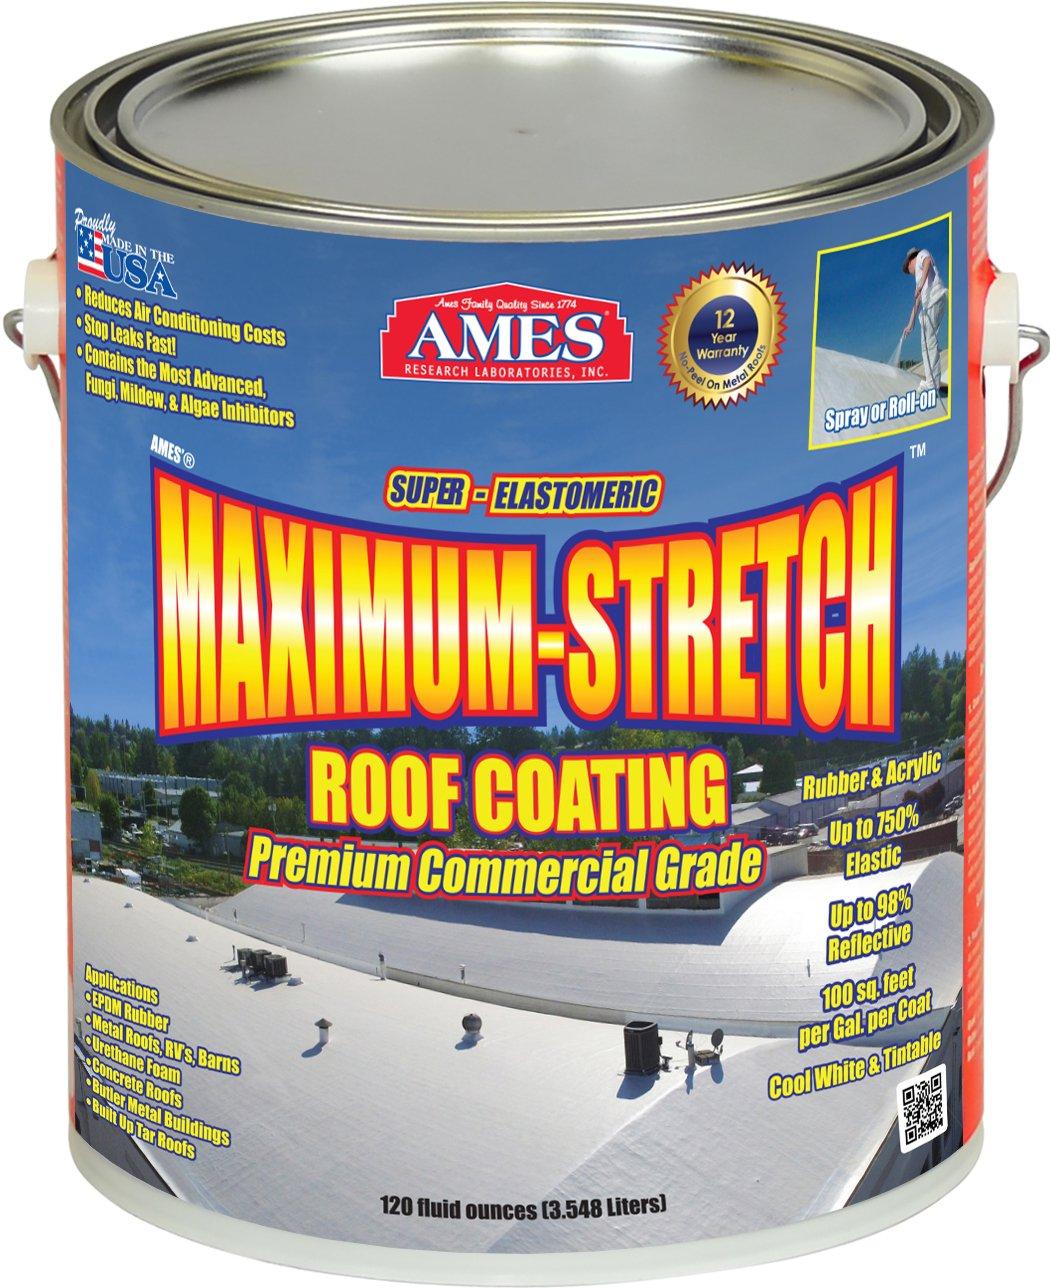 Ames Maximum Stretch 1 gallon Grey Maximum Stretch Roof coating by Ames